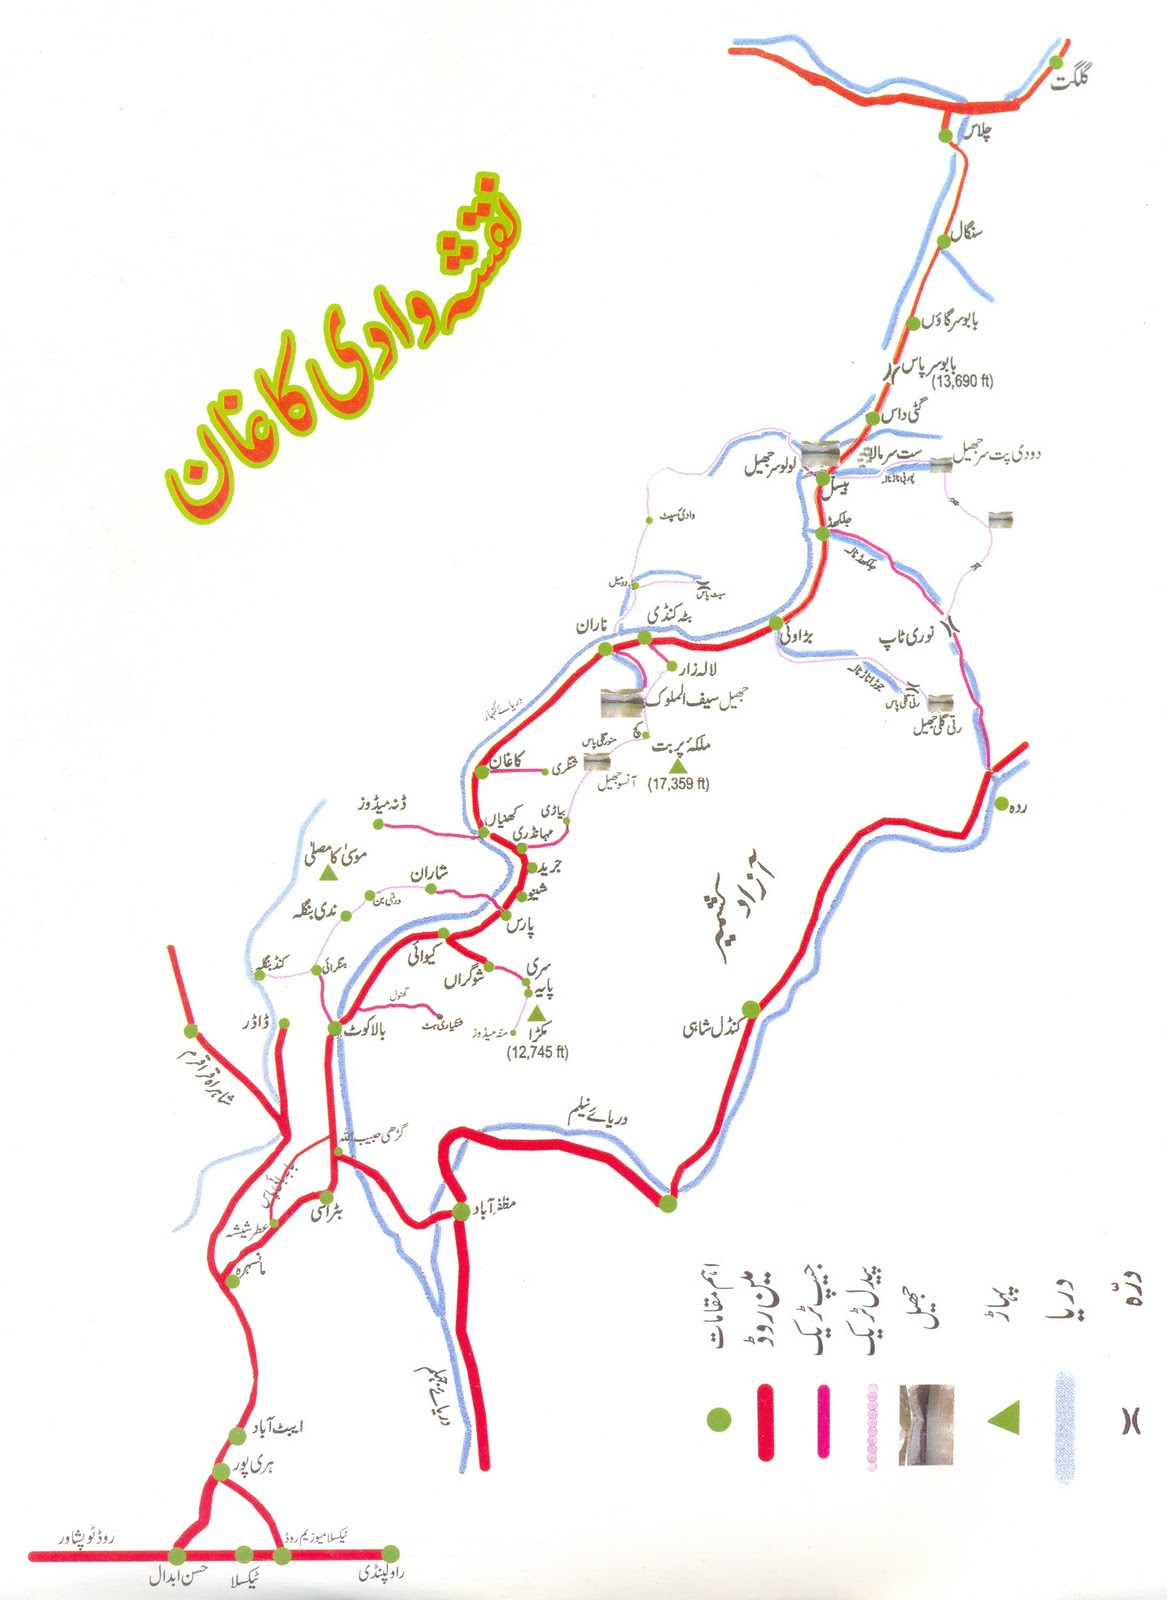 Urdu Map Images - Reverse Search